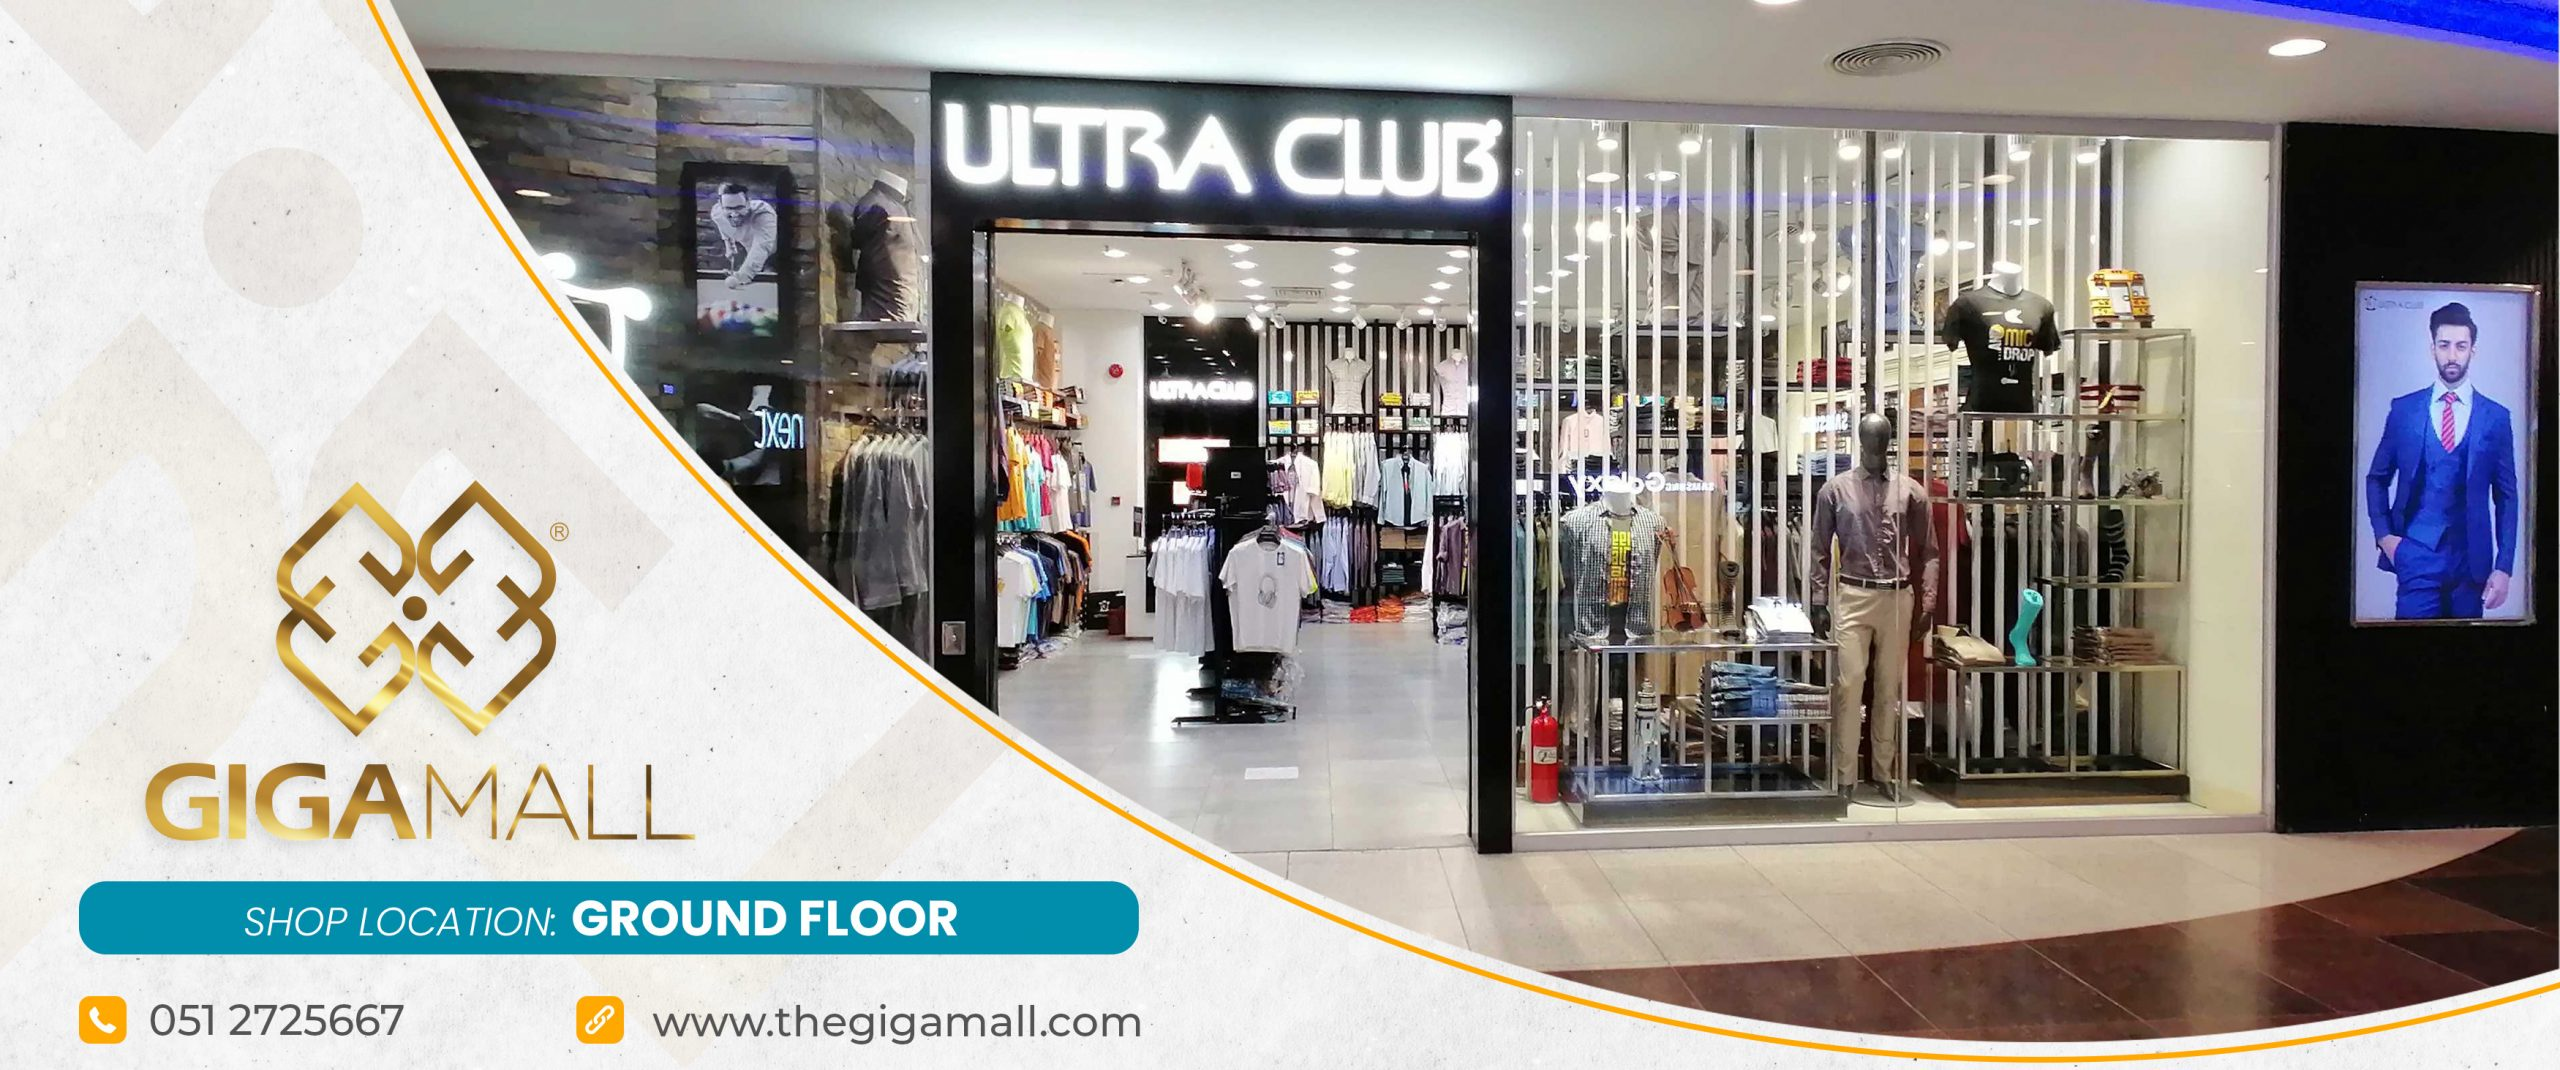 Ultra Club Clothing   Giga Mall   Giga Mall Pakistan